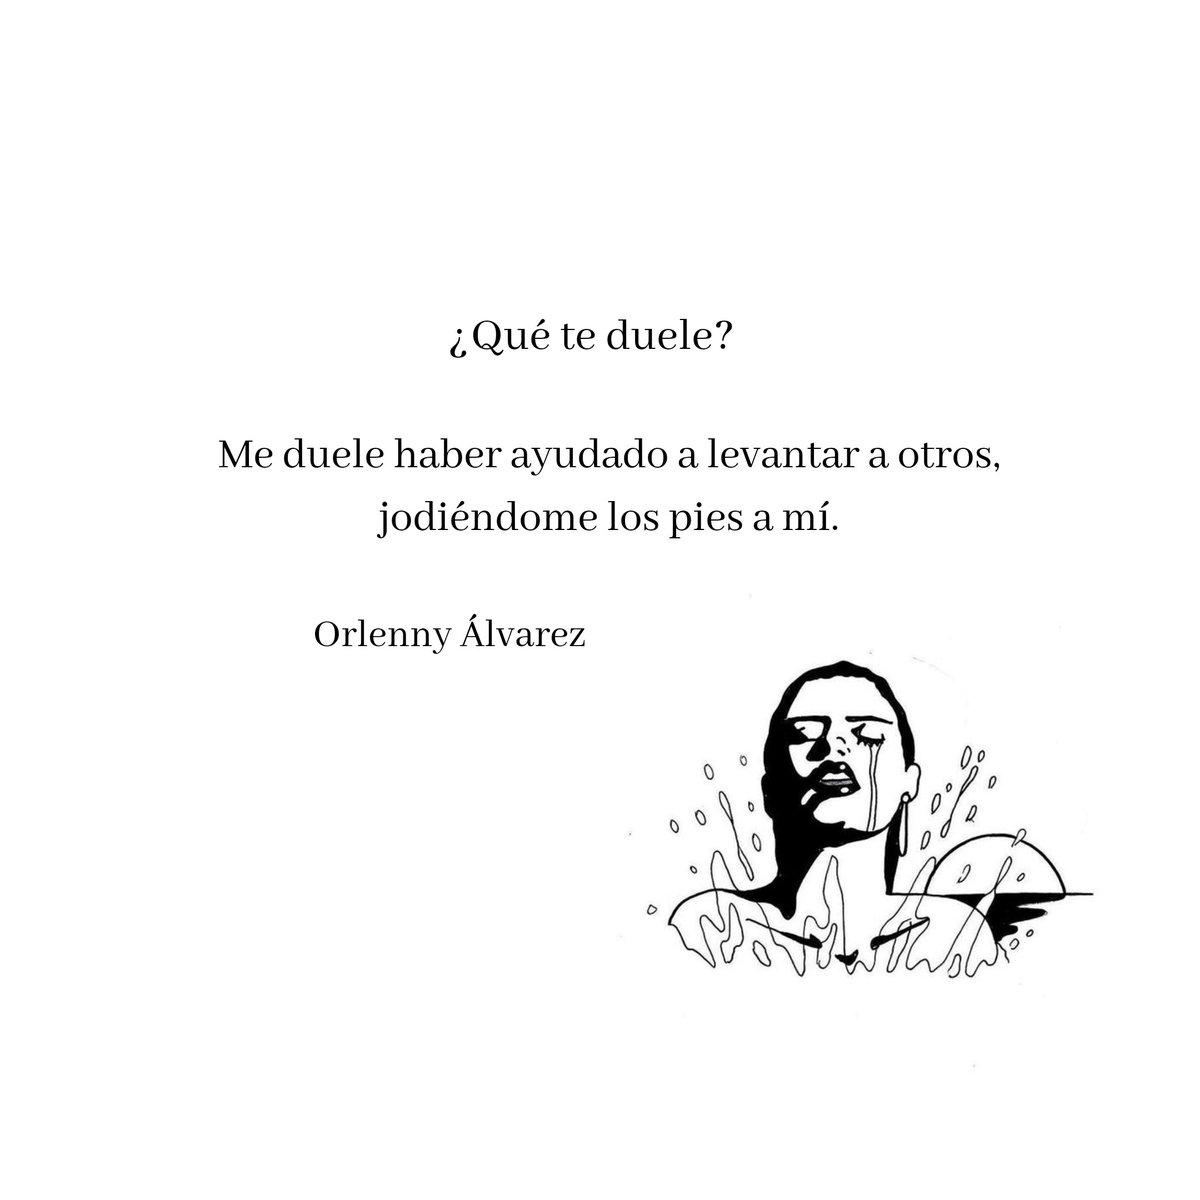 @ImageThink @InZgz81 @ArteEast #frasesbonitas #escritores #versos #reflectionspic.twitter.com/tf9ORBdT1q